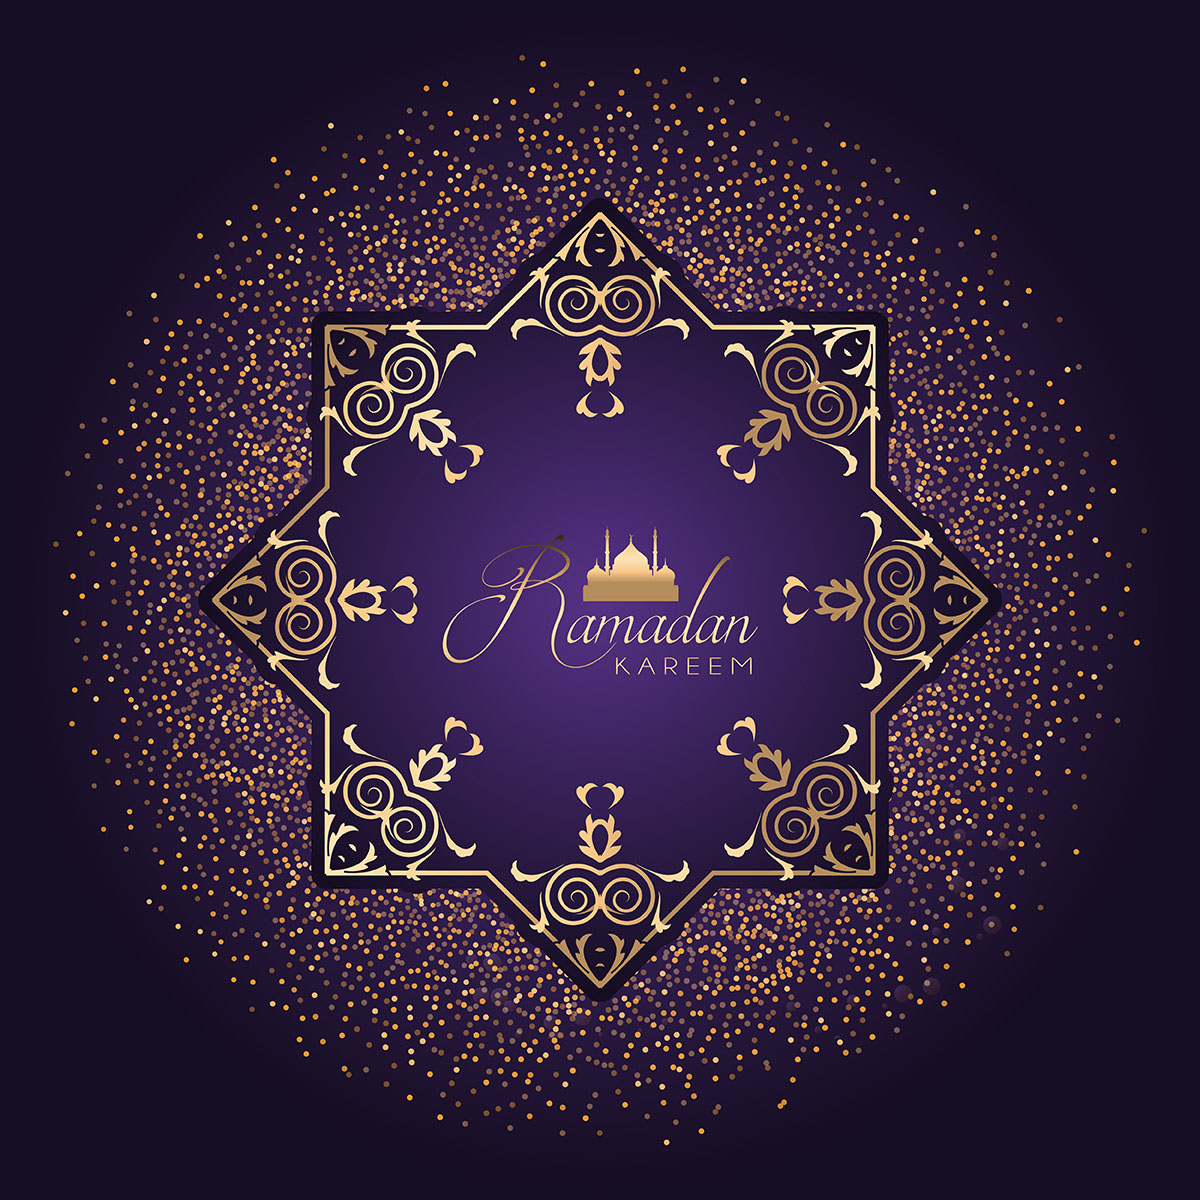 Decorative Ramadan background with confetti